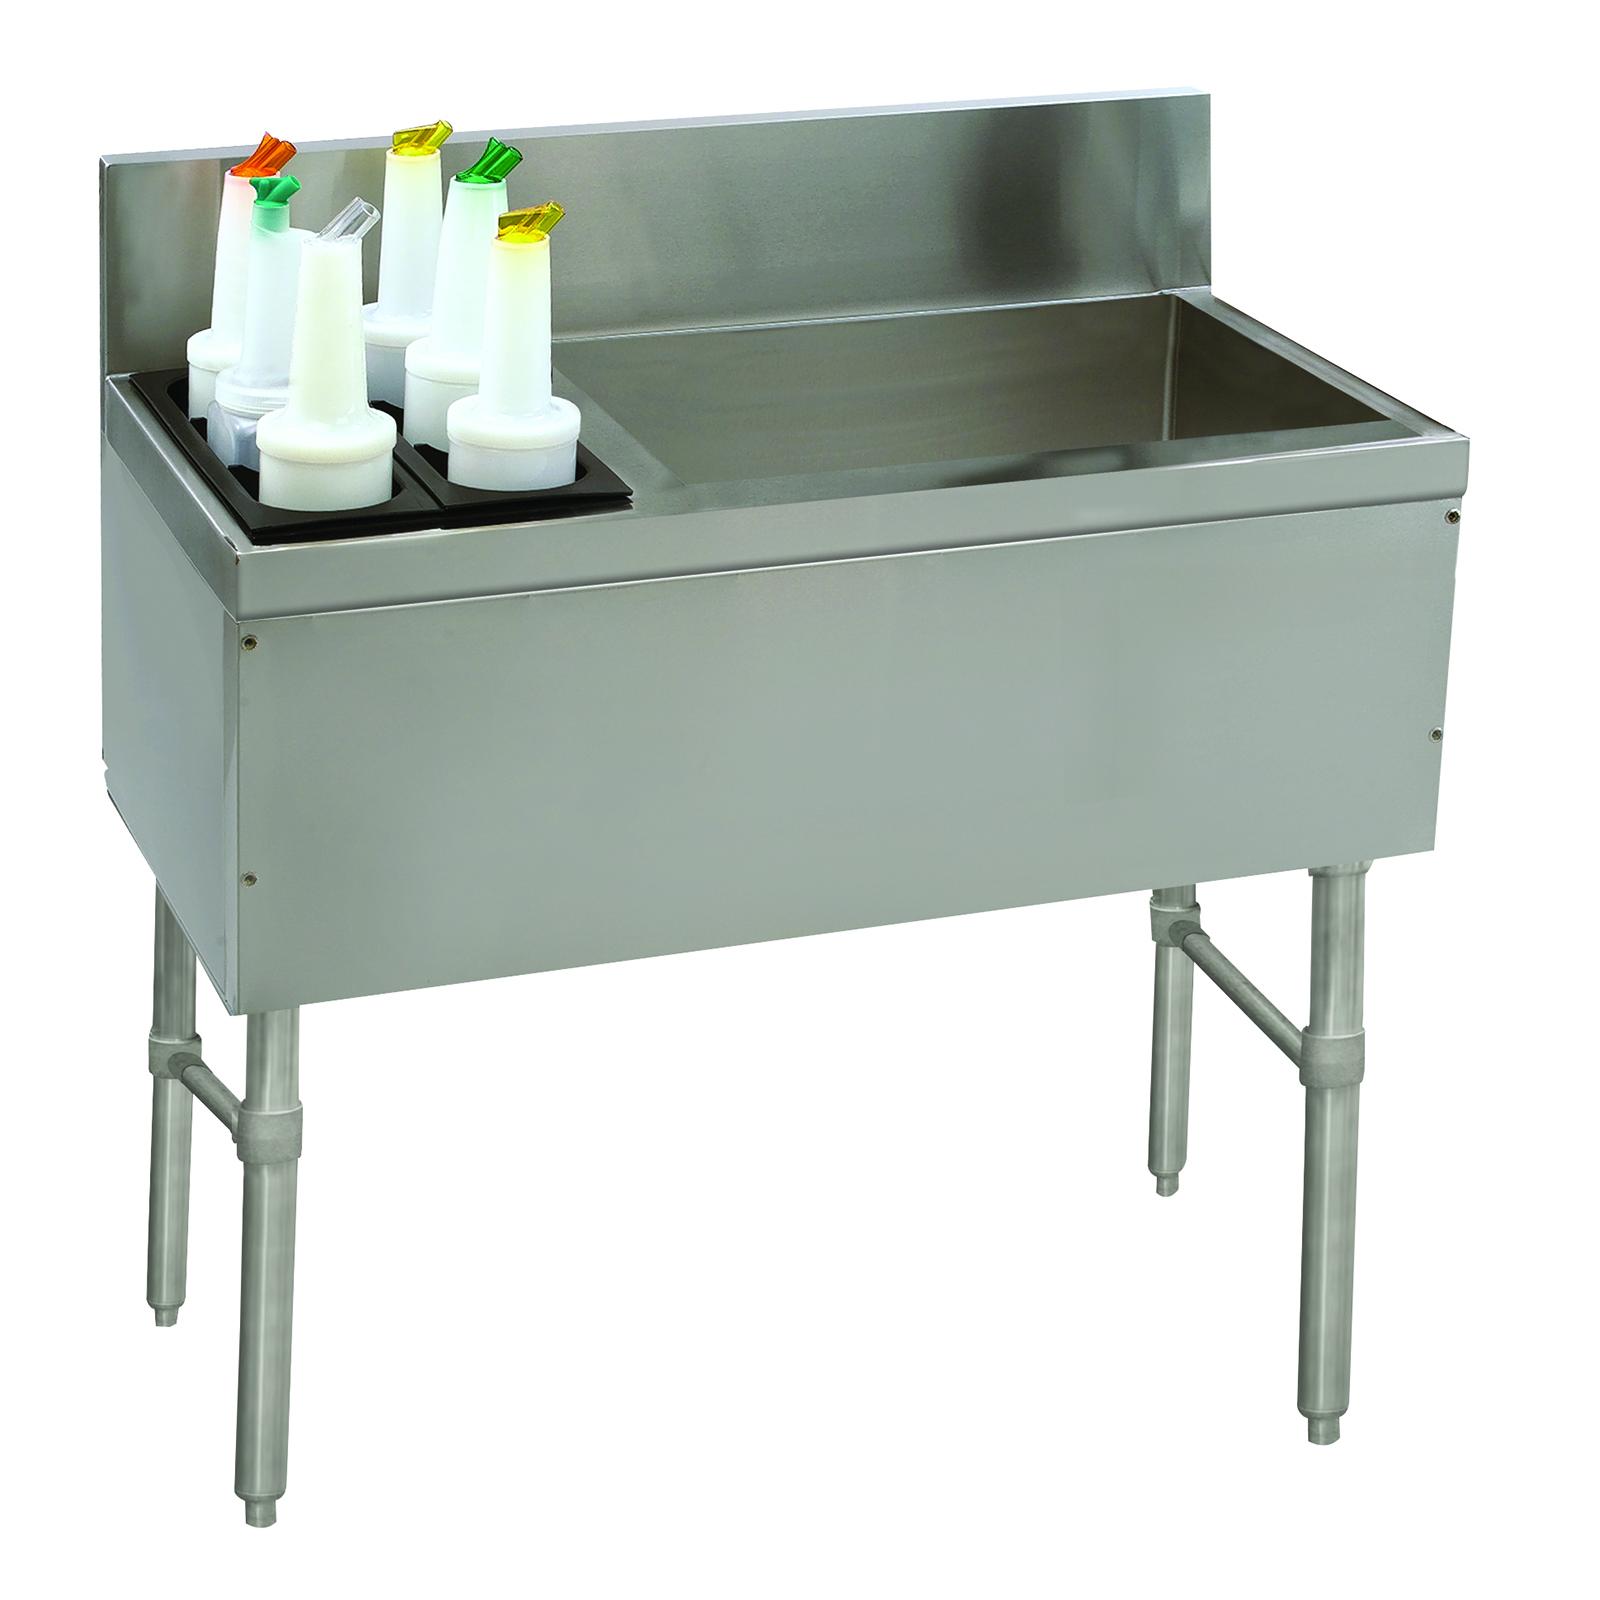 Advance Tabco PRC-19-48R underbar ice bin/cocktail station, bottle well bin